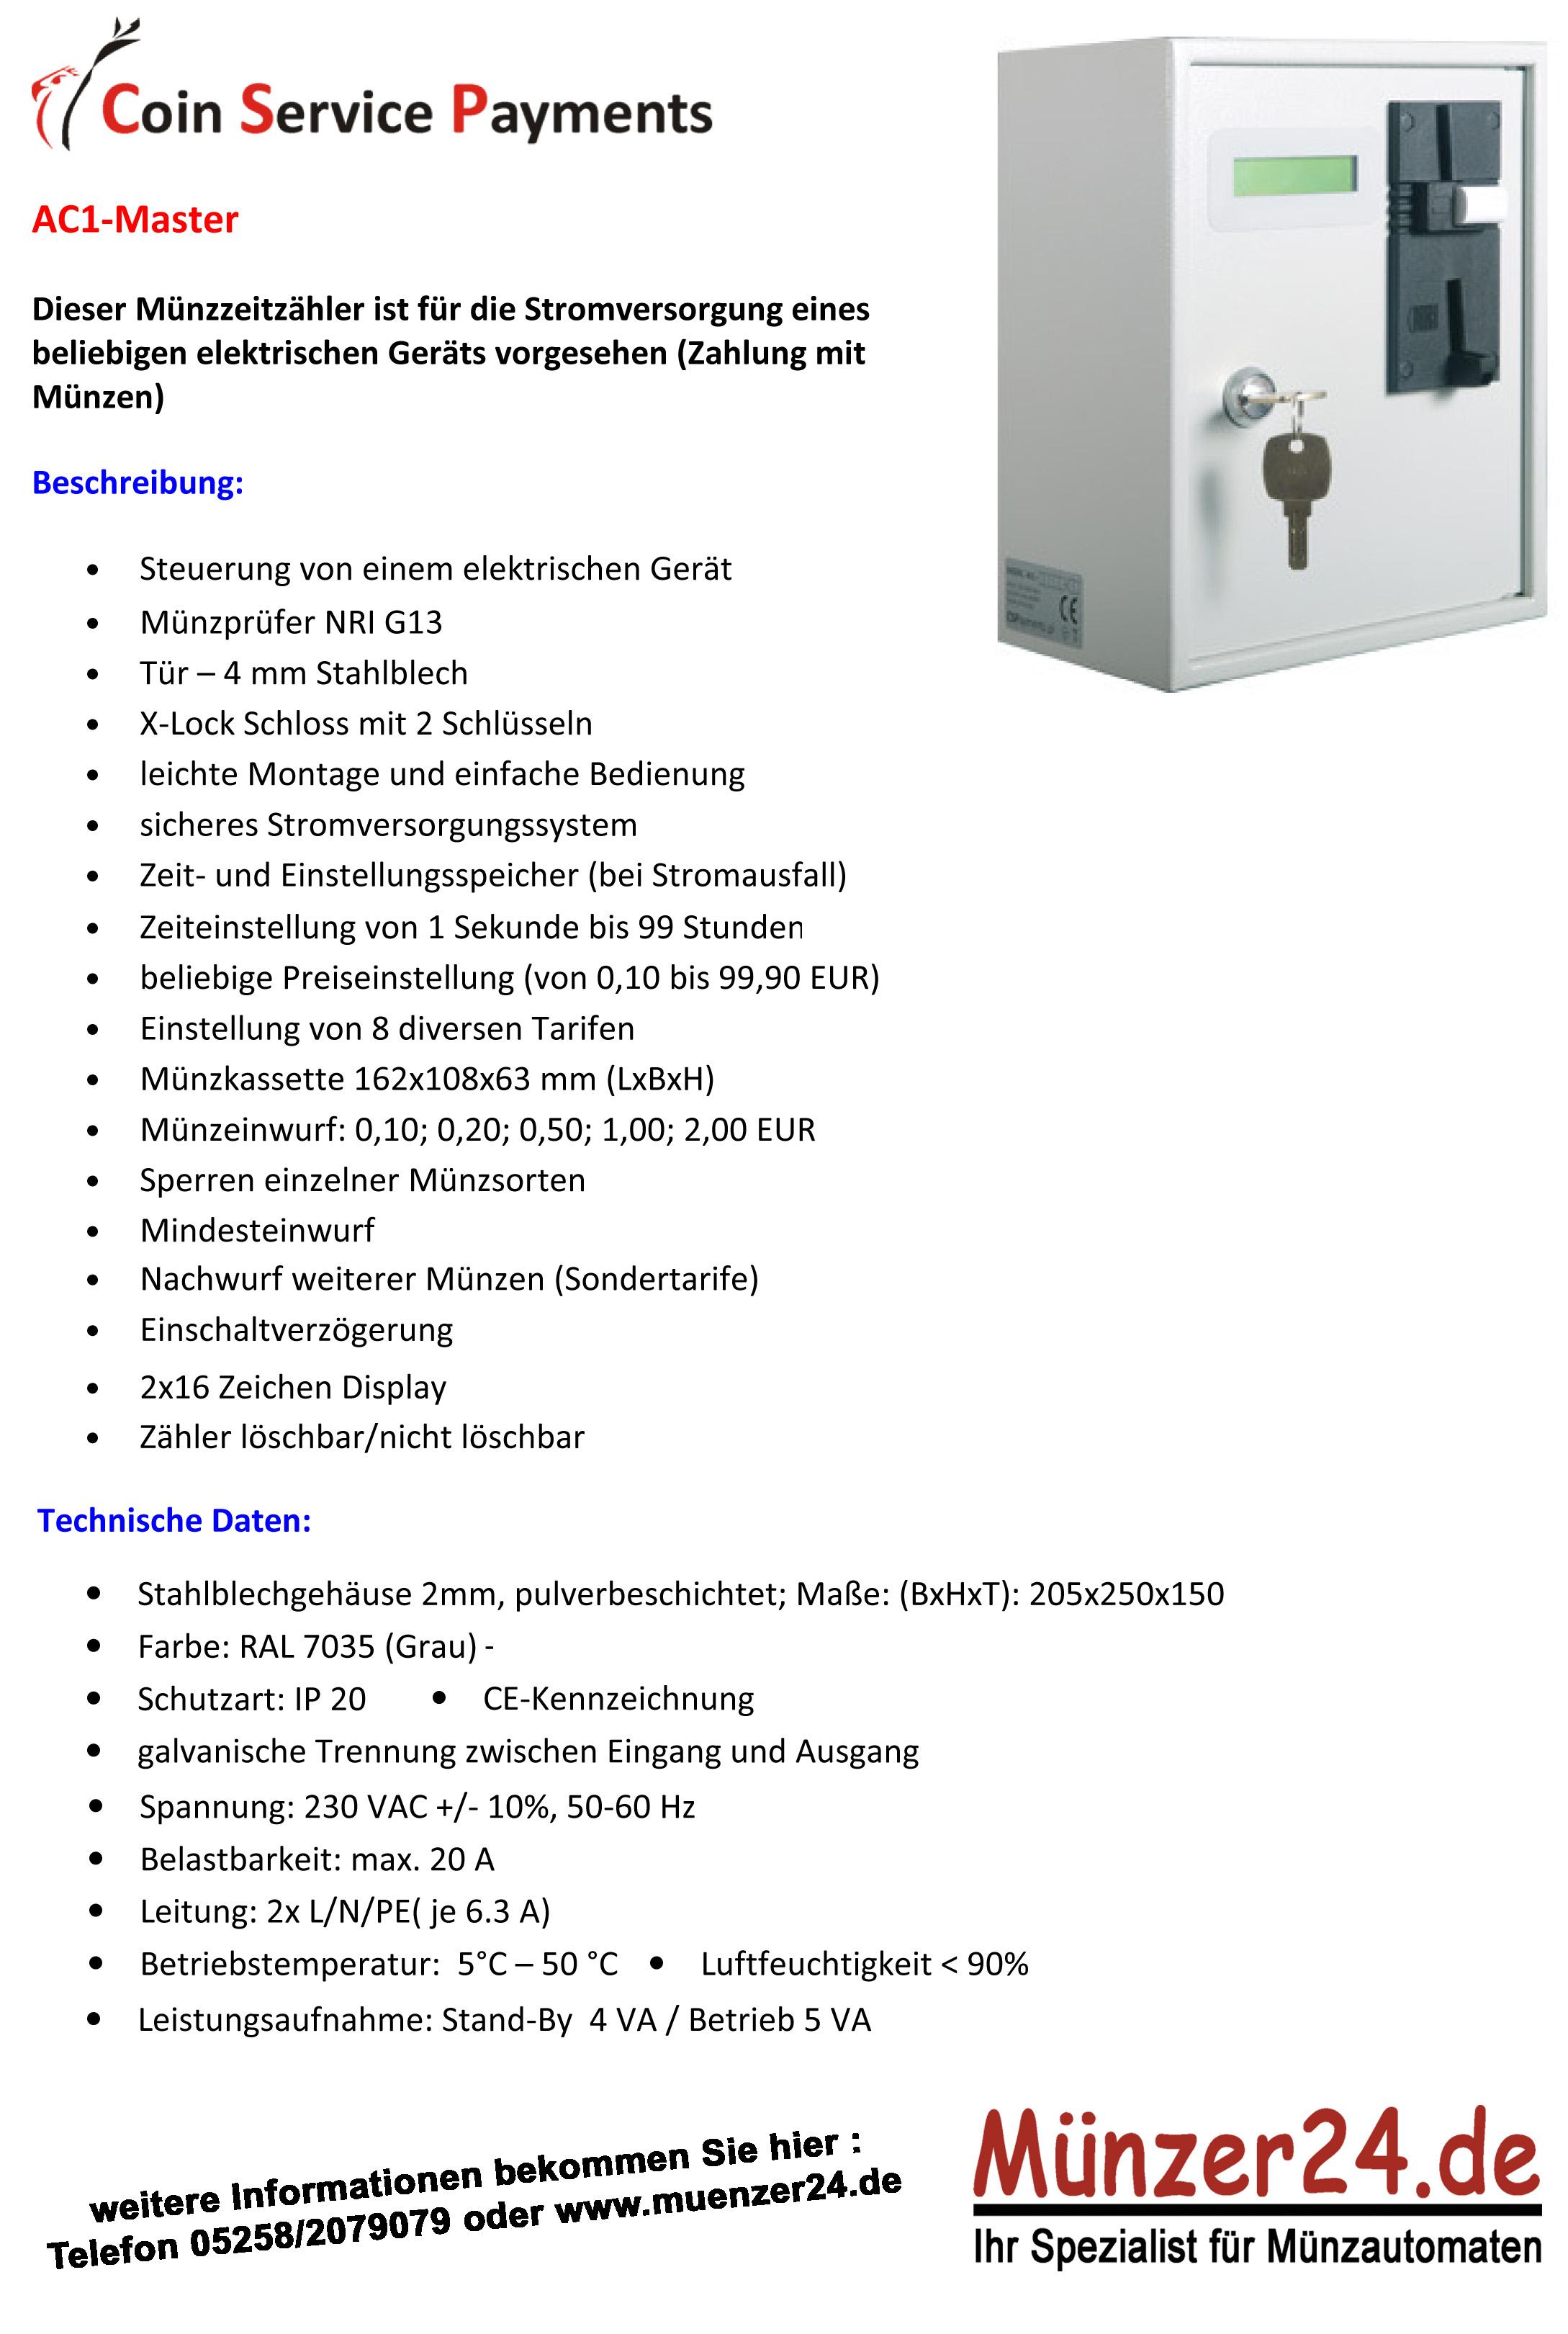 Prospekt Münzautomat CSP Master